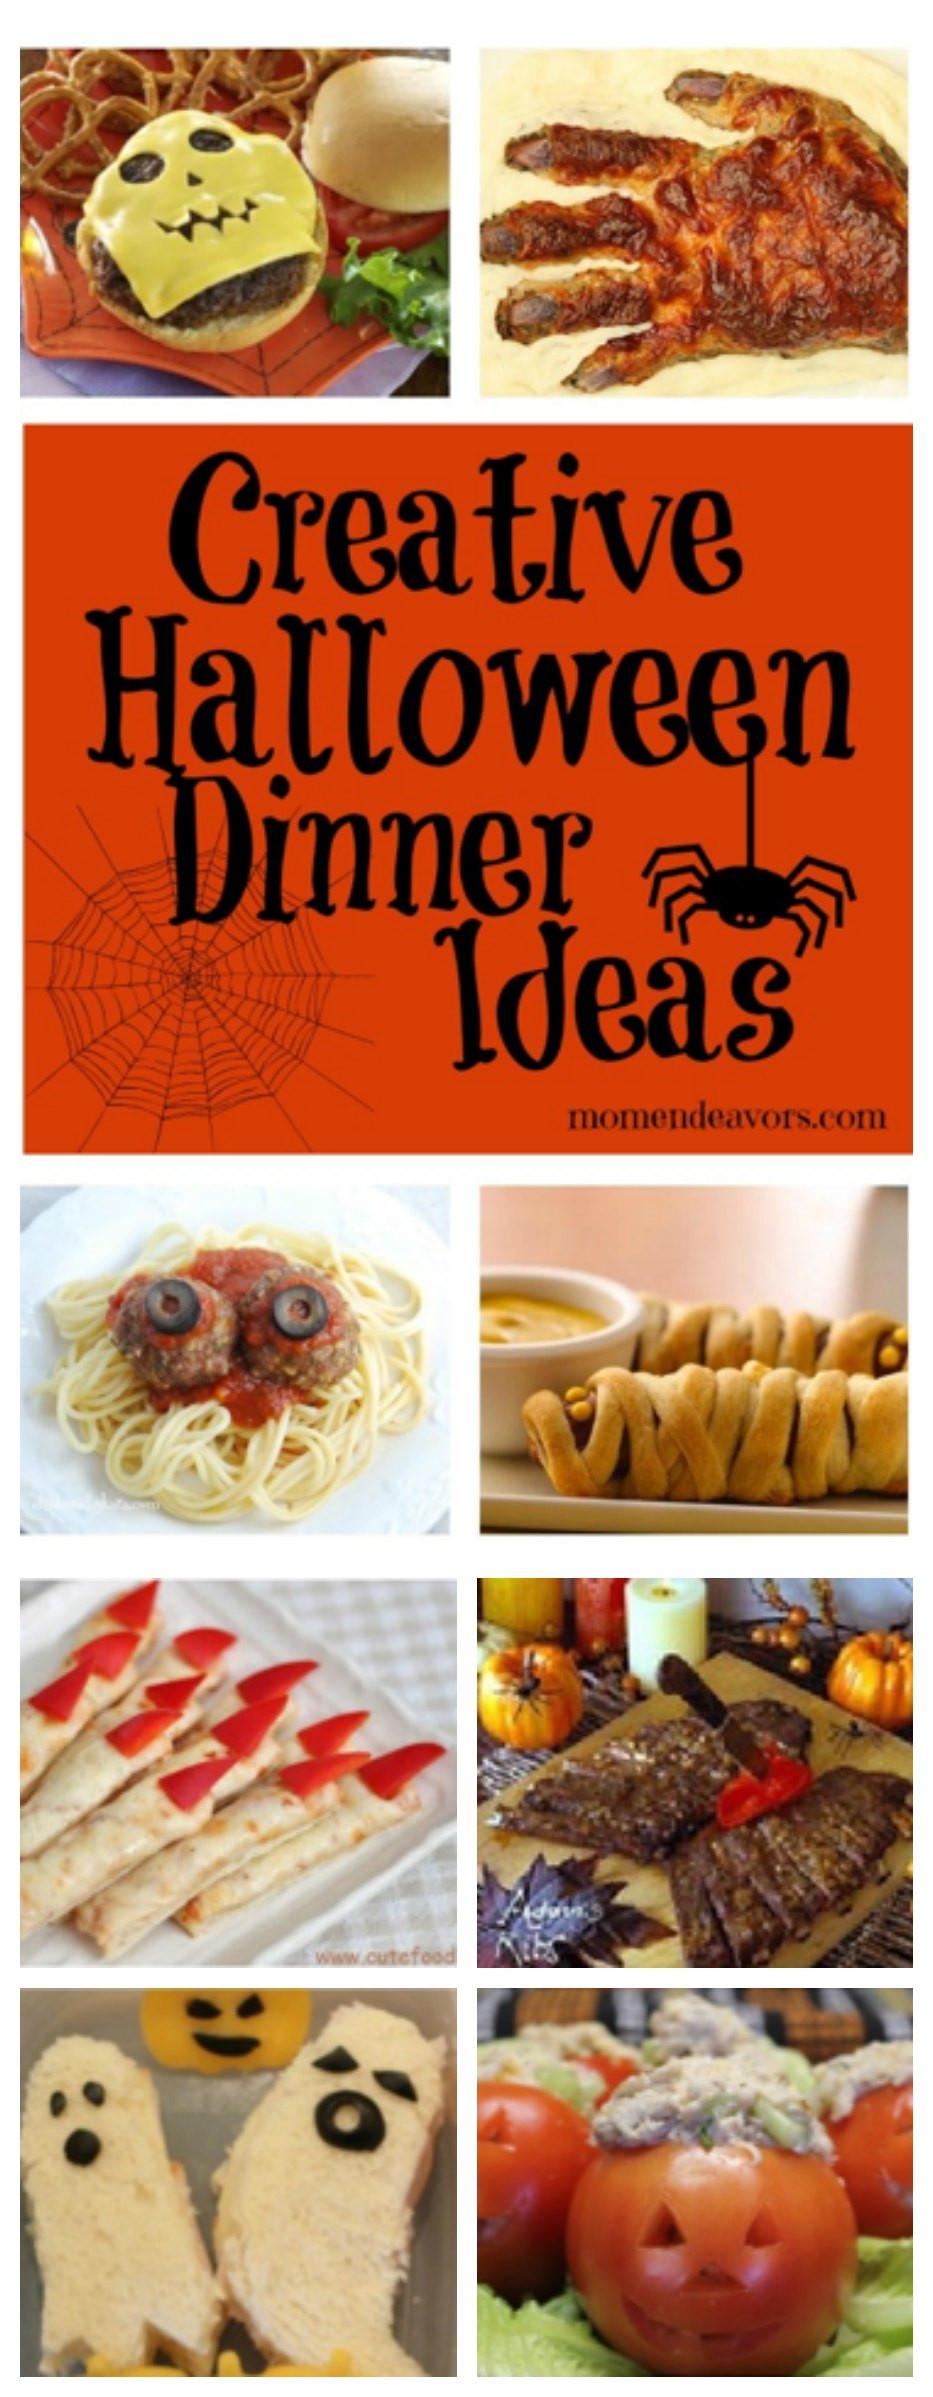 Creative Halloween Food Ideas  15 Creative Halloween Dinner Ideas